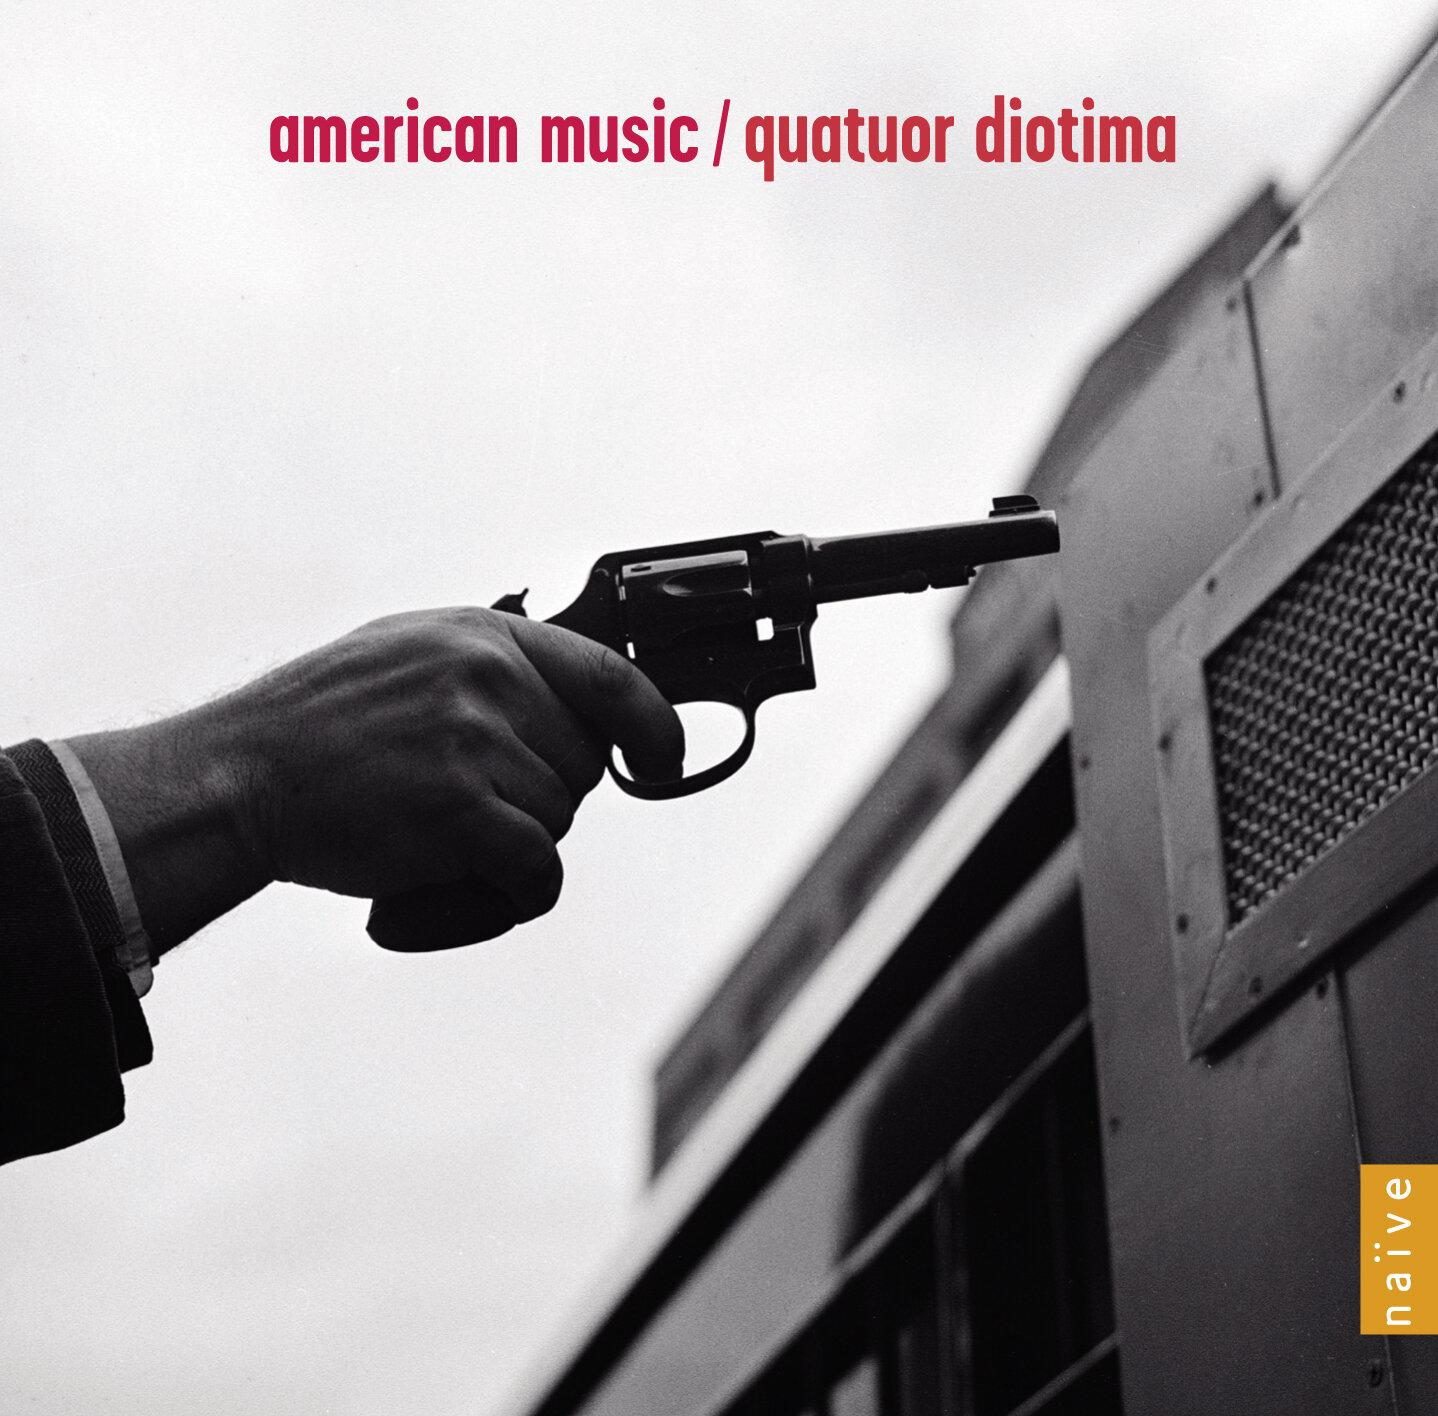 V5272 K American Music Quatuor Diotima.jpg